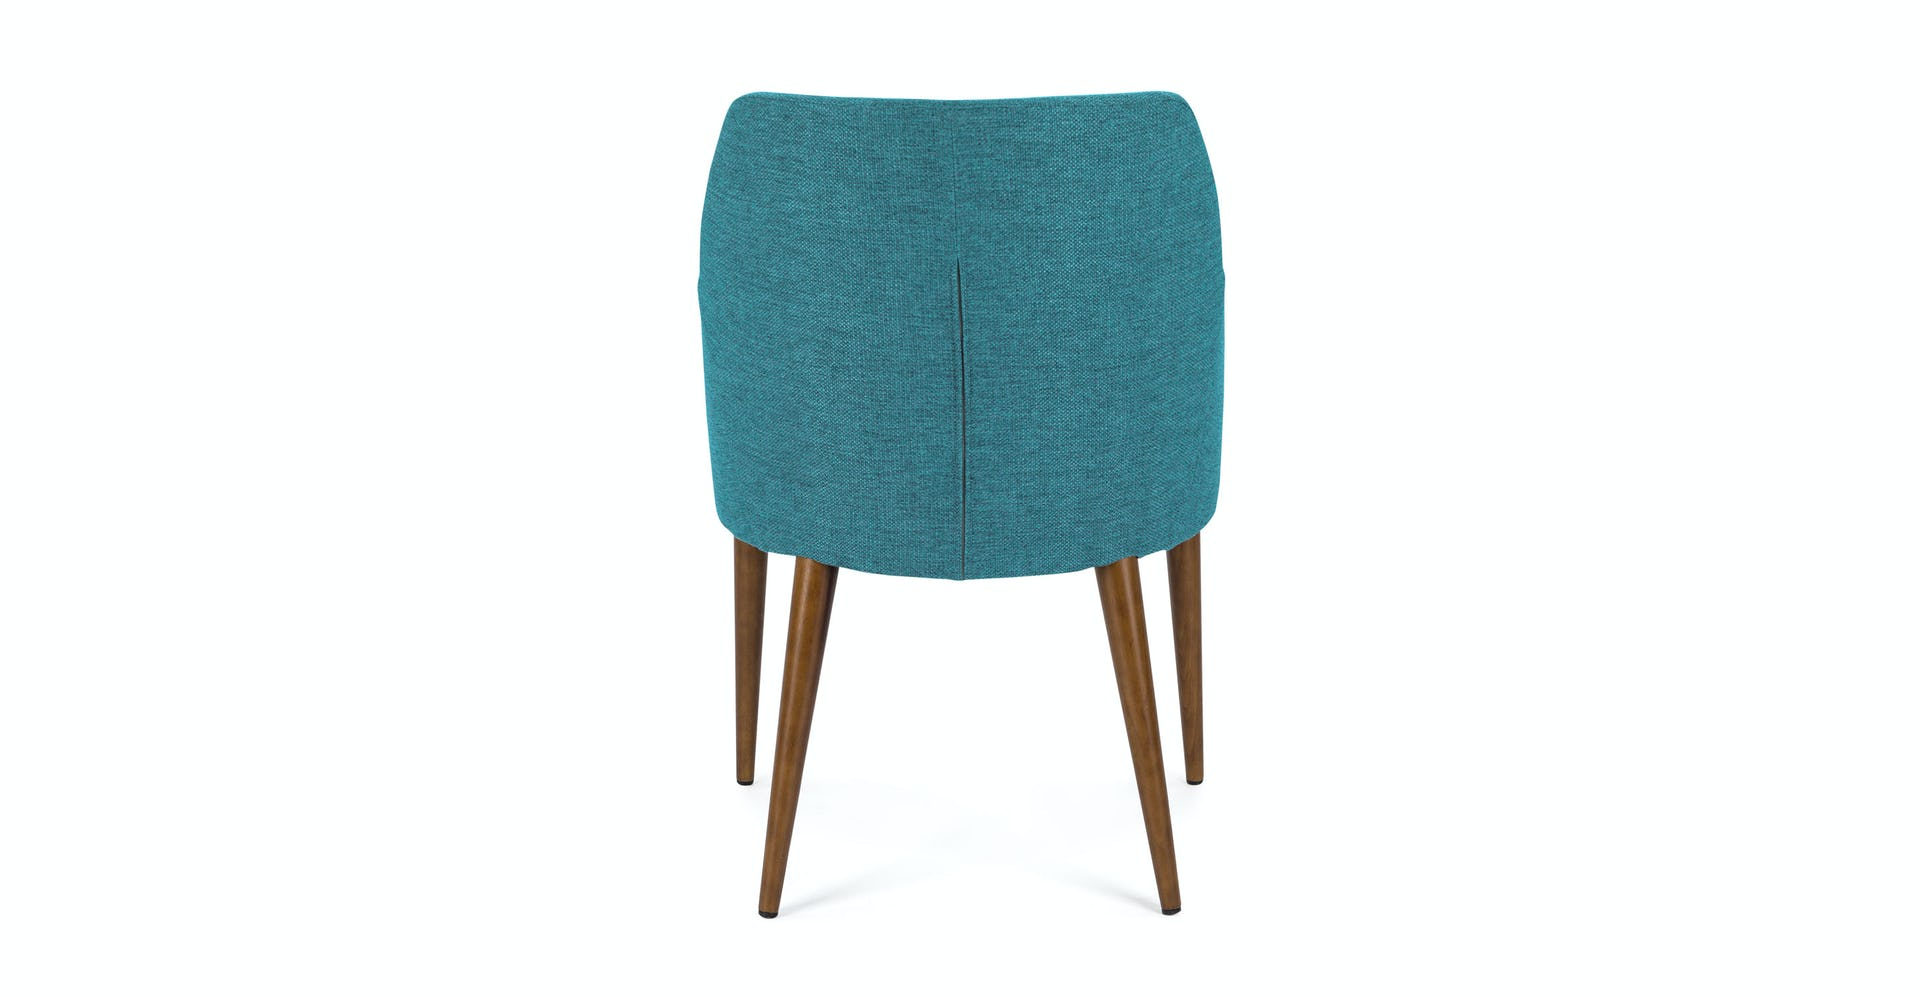 Terrific Arizona Turquoise Feast Fabric Office Chair Article Cjindustries Chair Design For Home Cjindustriesco